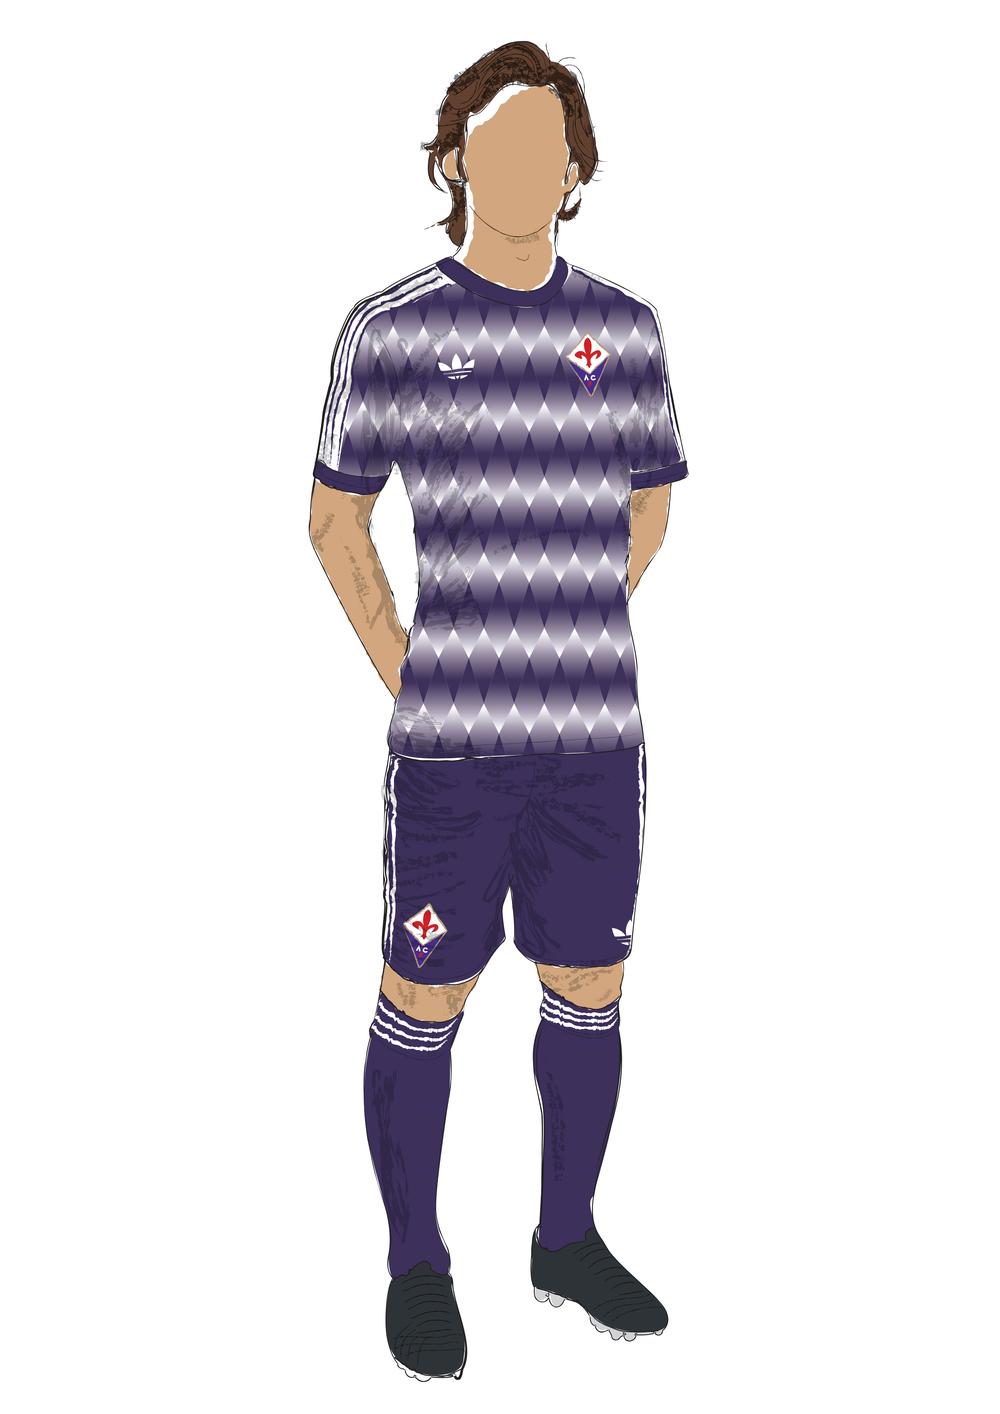 Fiorentina_IBWM.jpg